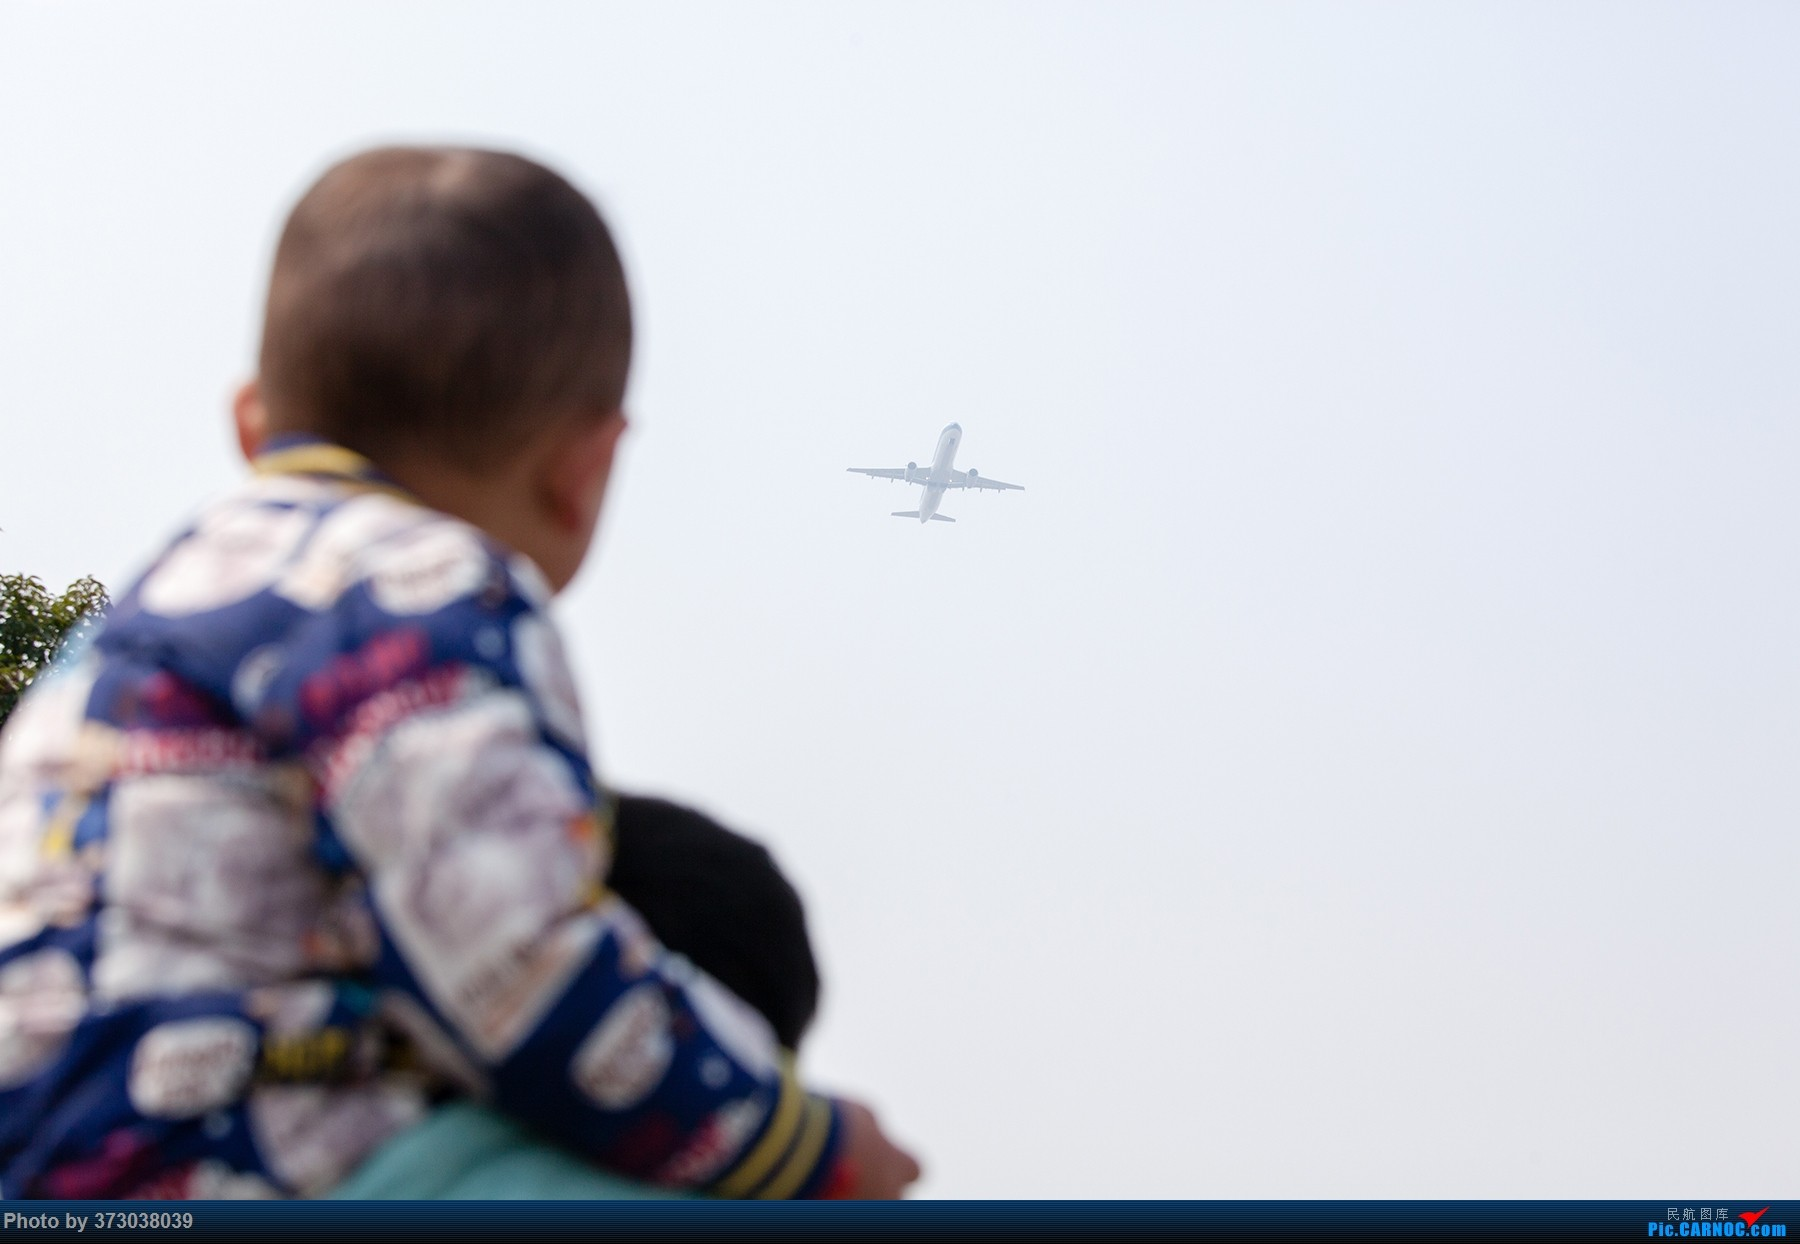 Re:[原创]【杭州飞友会】A320Neo迪士尼杭州萧山机场拍机班门弄斧记 BOEING 737-800 B-5581 中国杭州萧山国际机场  飞友